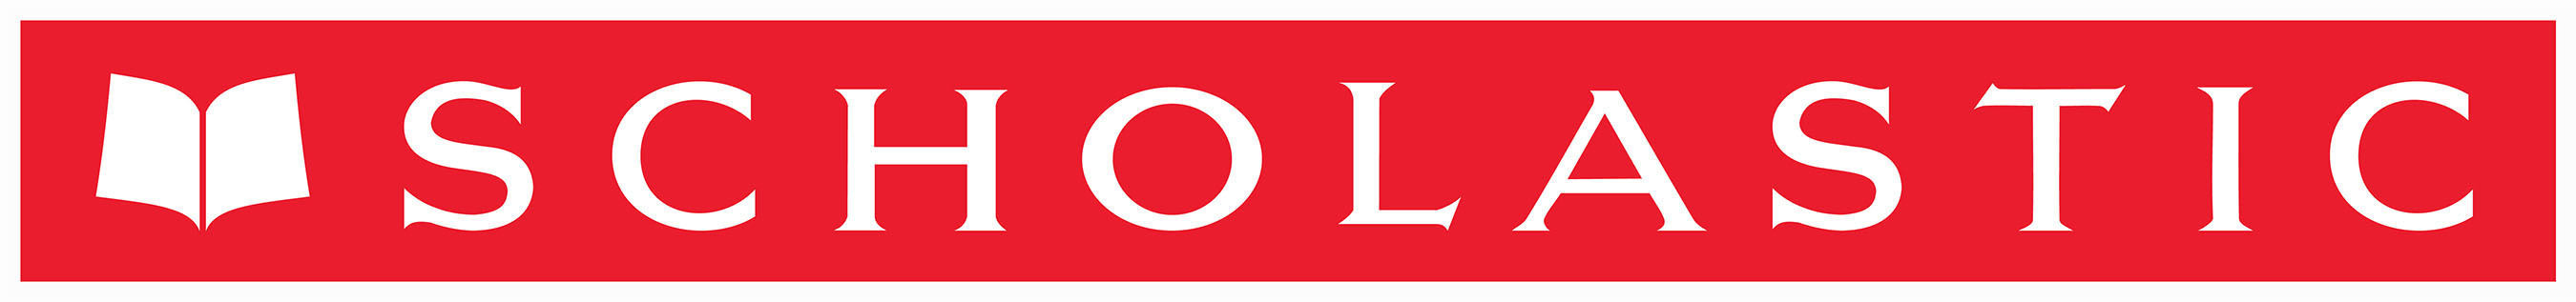 Scholastic Inc. Logo. (PRNewsFoto/Netflix, Inc.) (PRNewsFoto/NETFLIX, INC.)